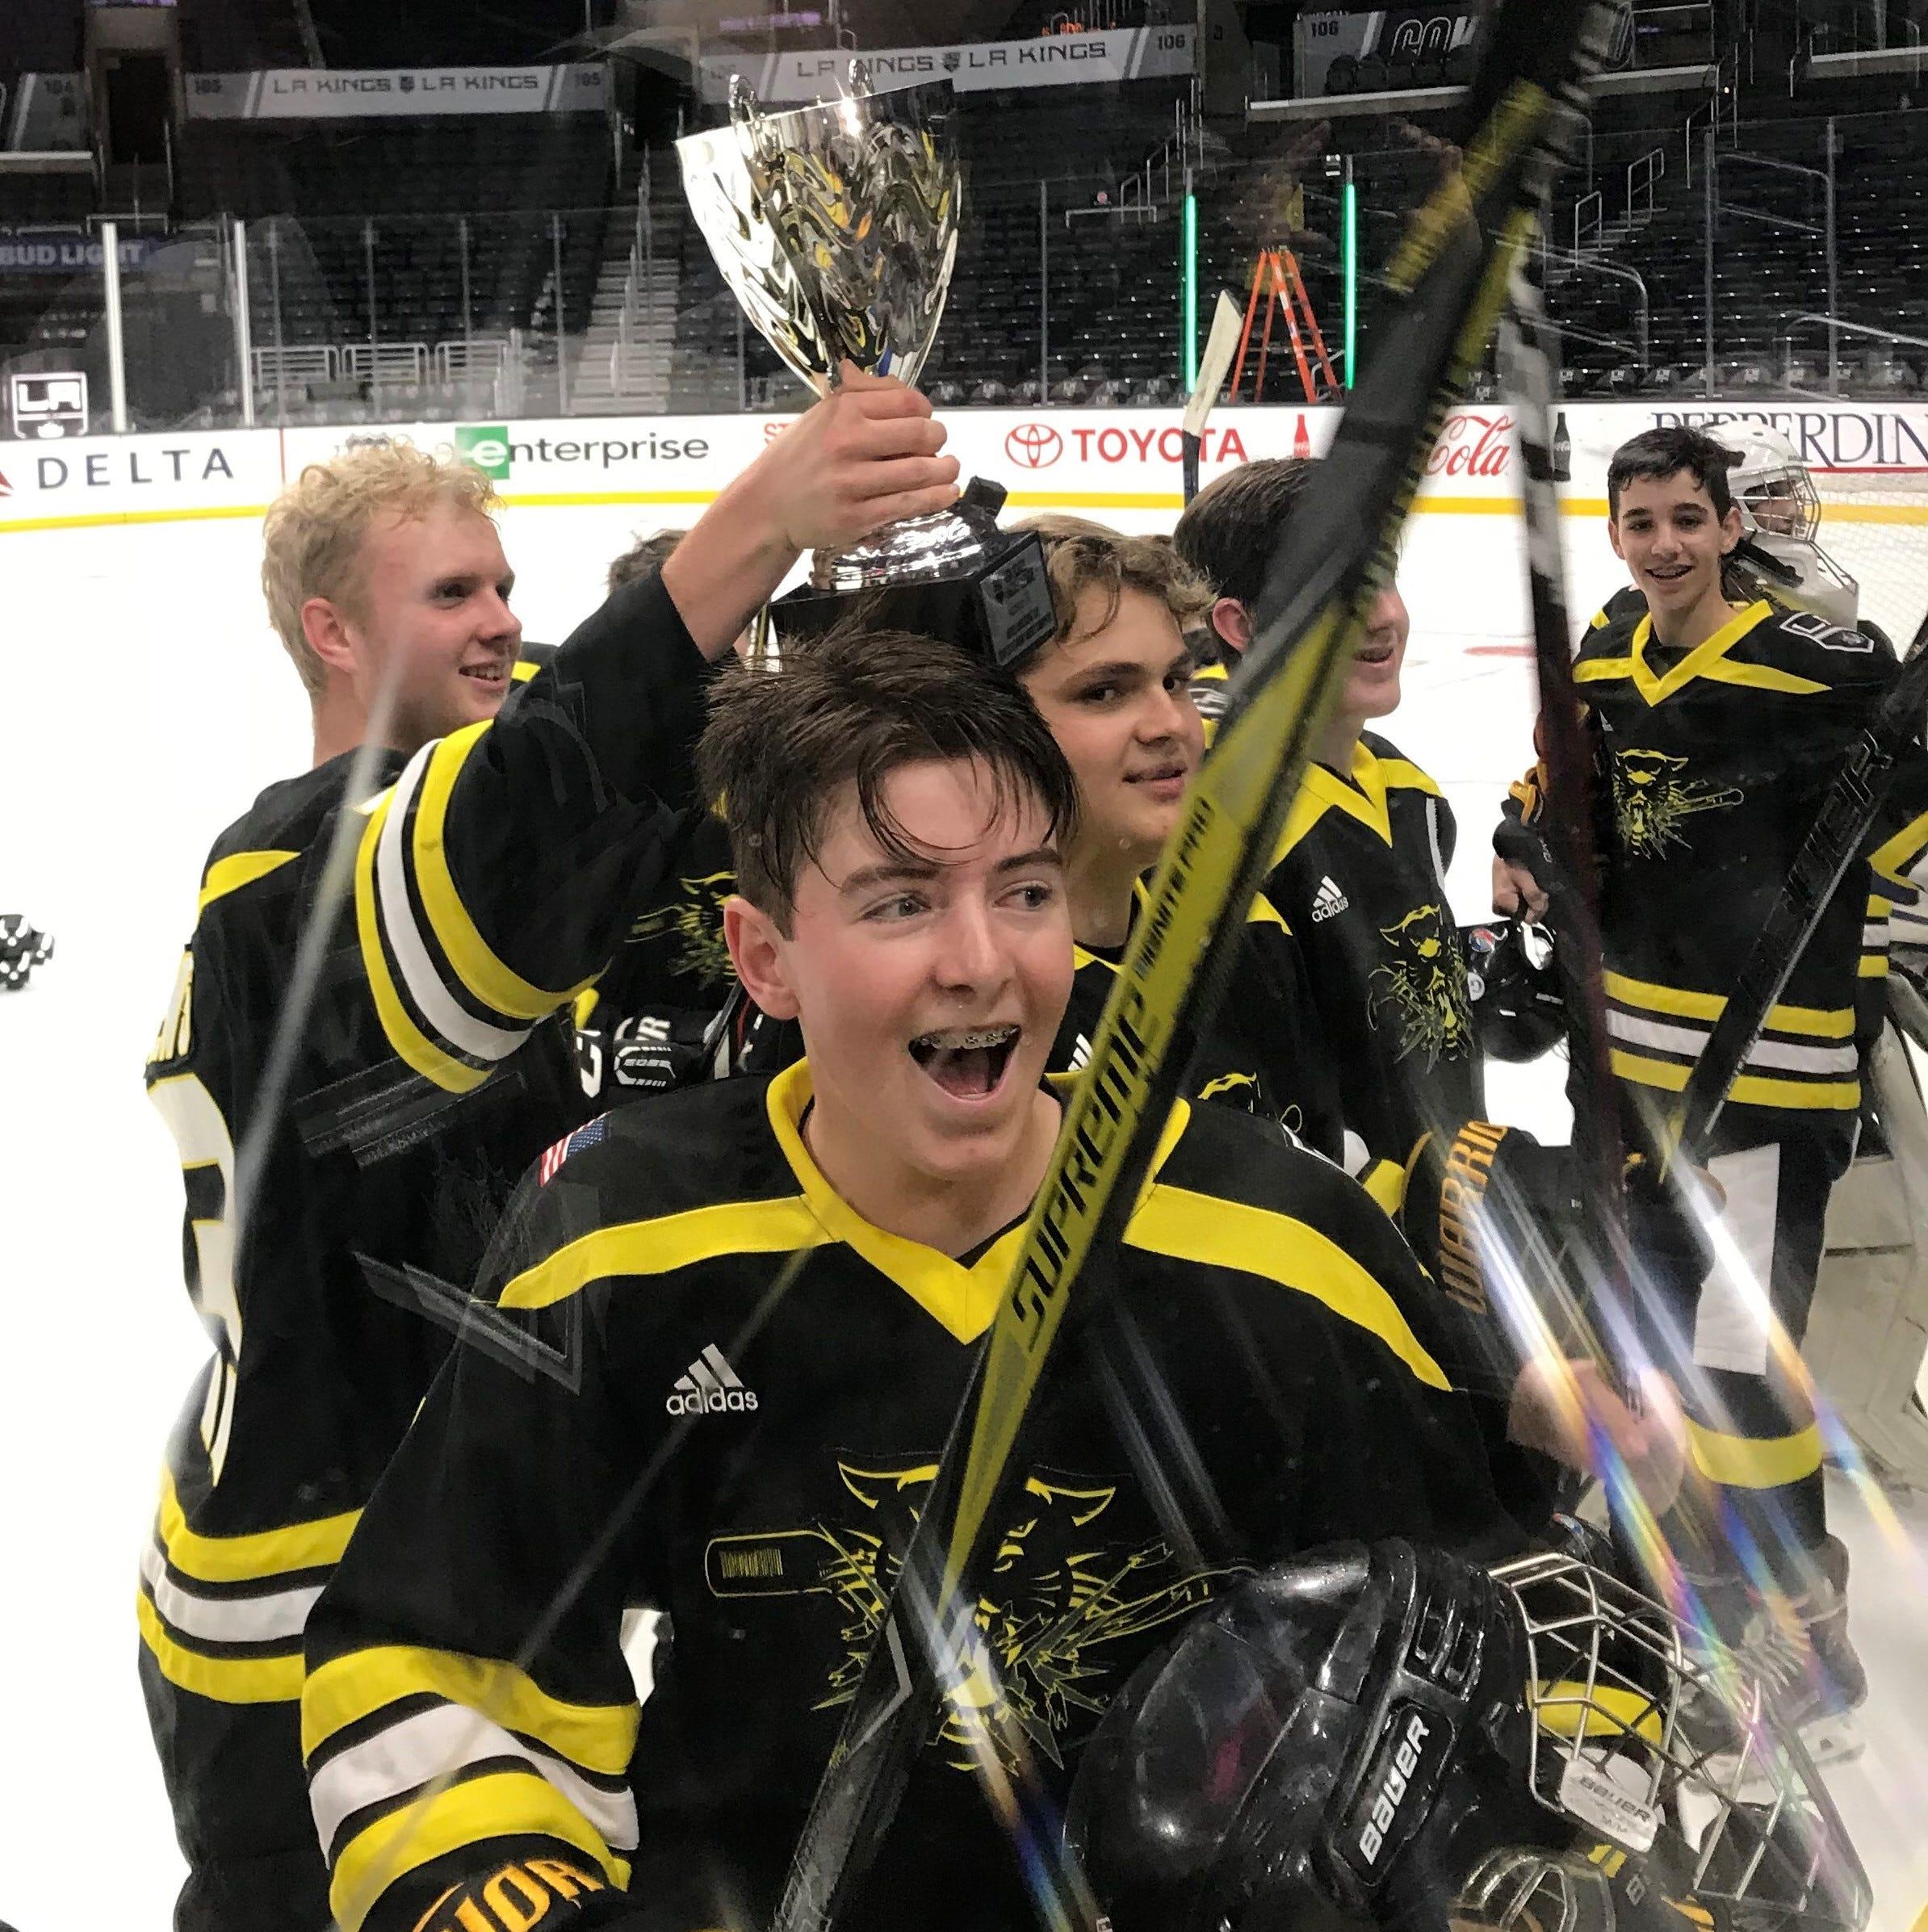 Newbury Park JV team wins Kings High School Hockey League championship game